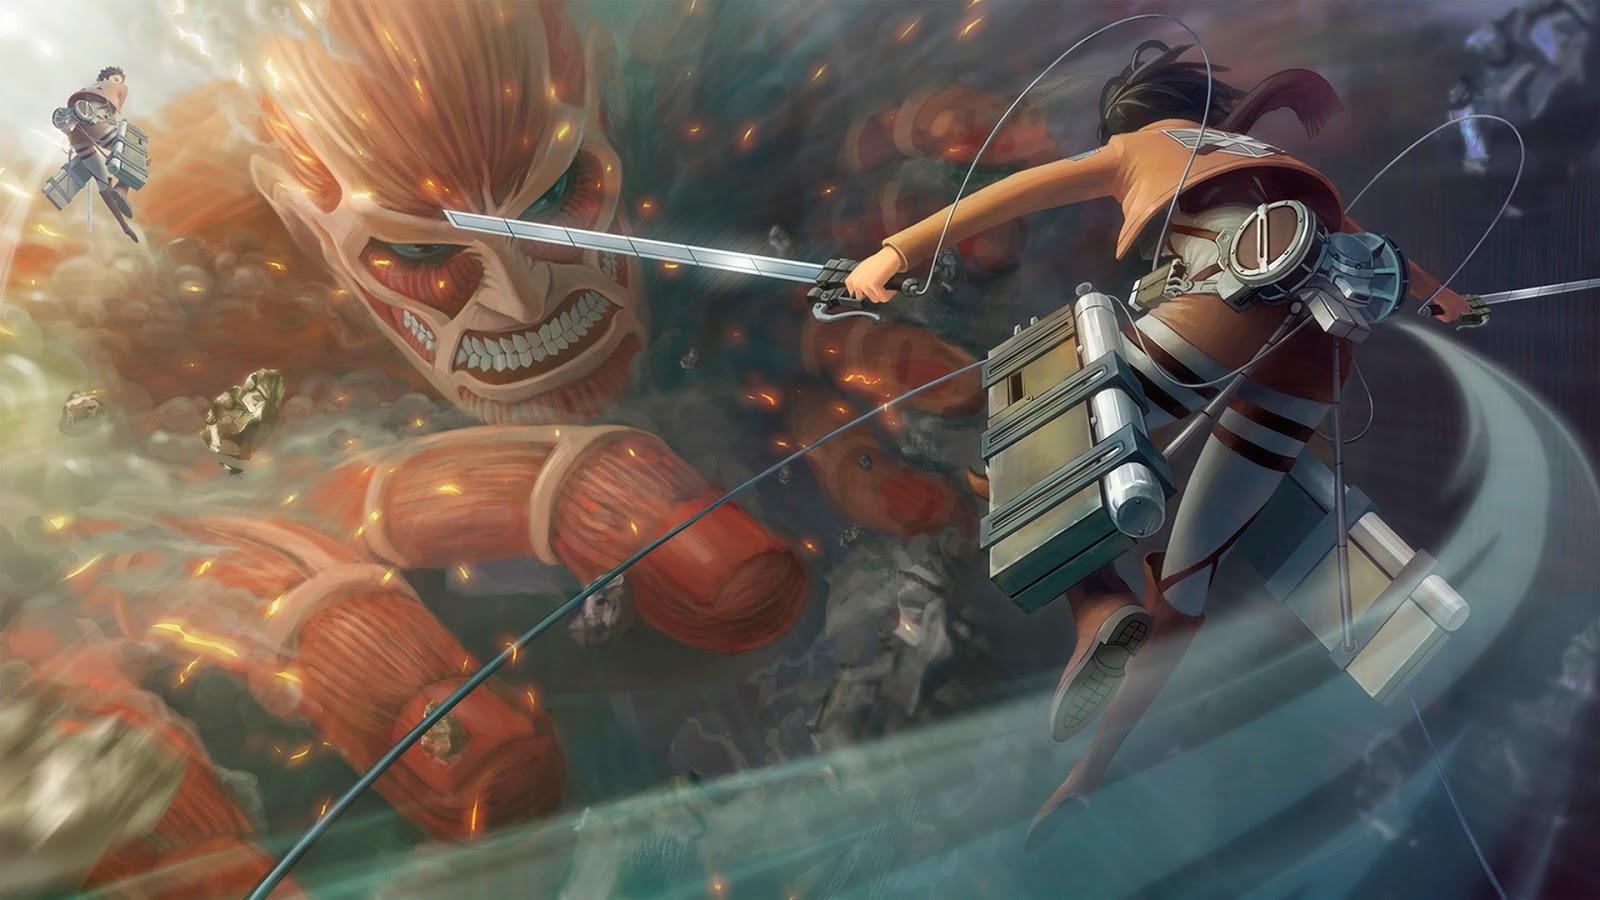 fighting titan attack on titan shingeki no kyojin anime hd wallpaper 1600x900